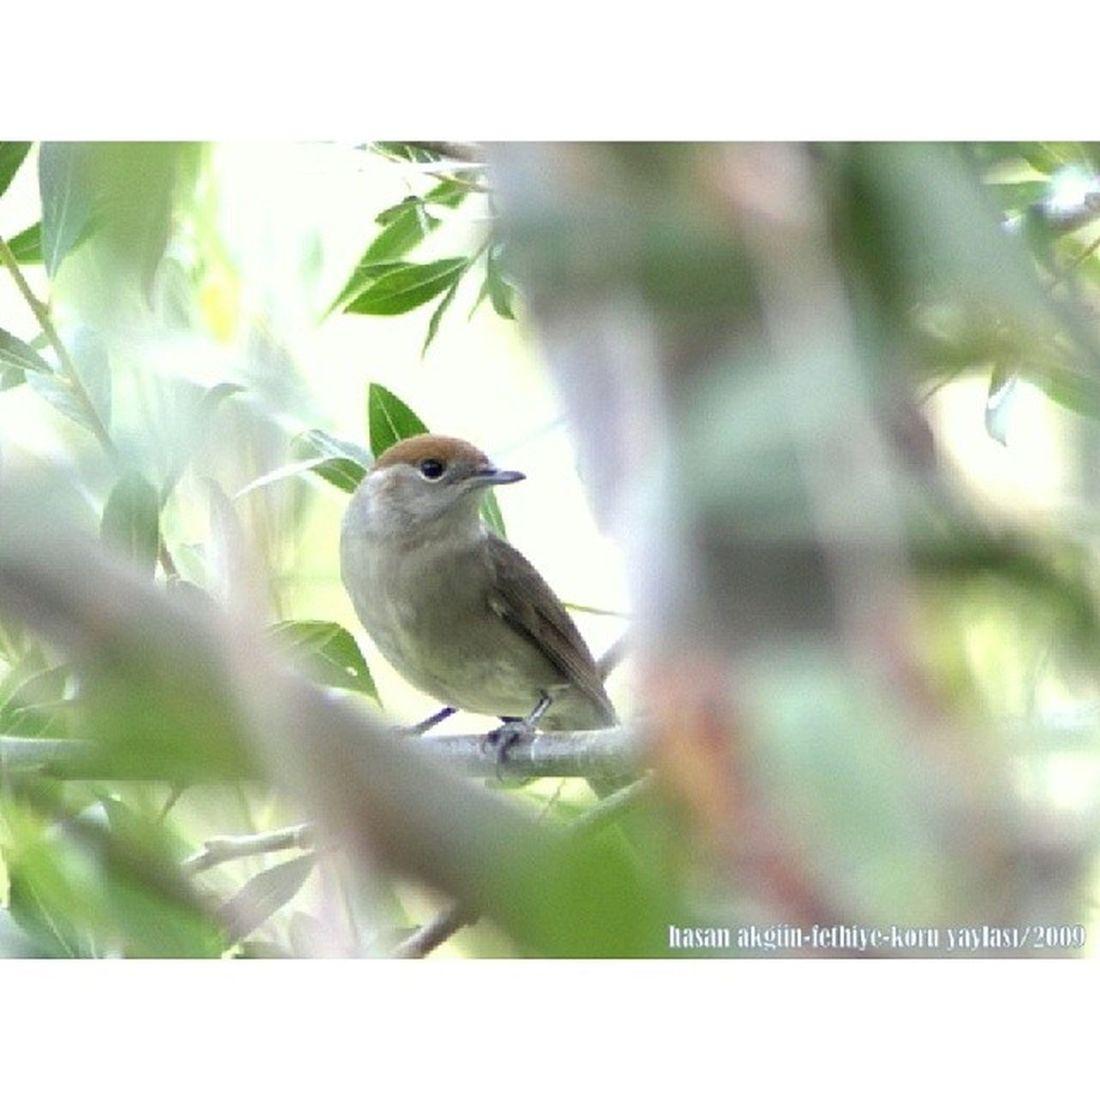 (Arşivimden) Karabaş Ötleğen -Blackcap FETHİYE KORU YAYLASI Blackcap Karaba şlıõtleğen Bird Natura cute magic beautiful wild_life life canon canoneos450D tamron75mm300mm untreated işlemsiz